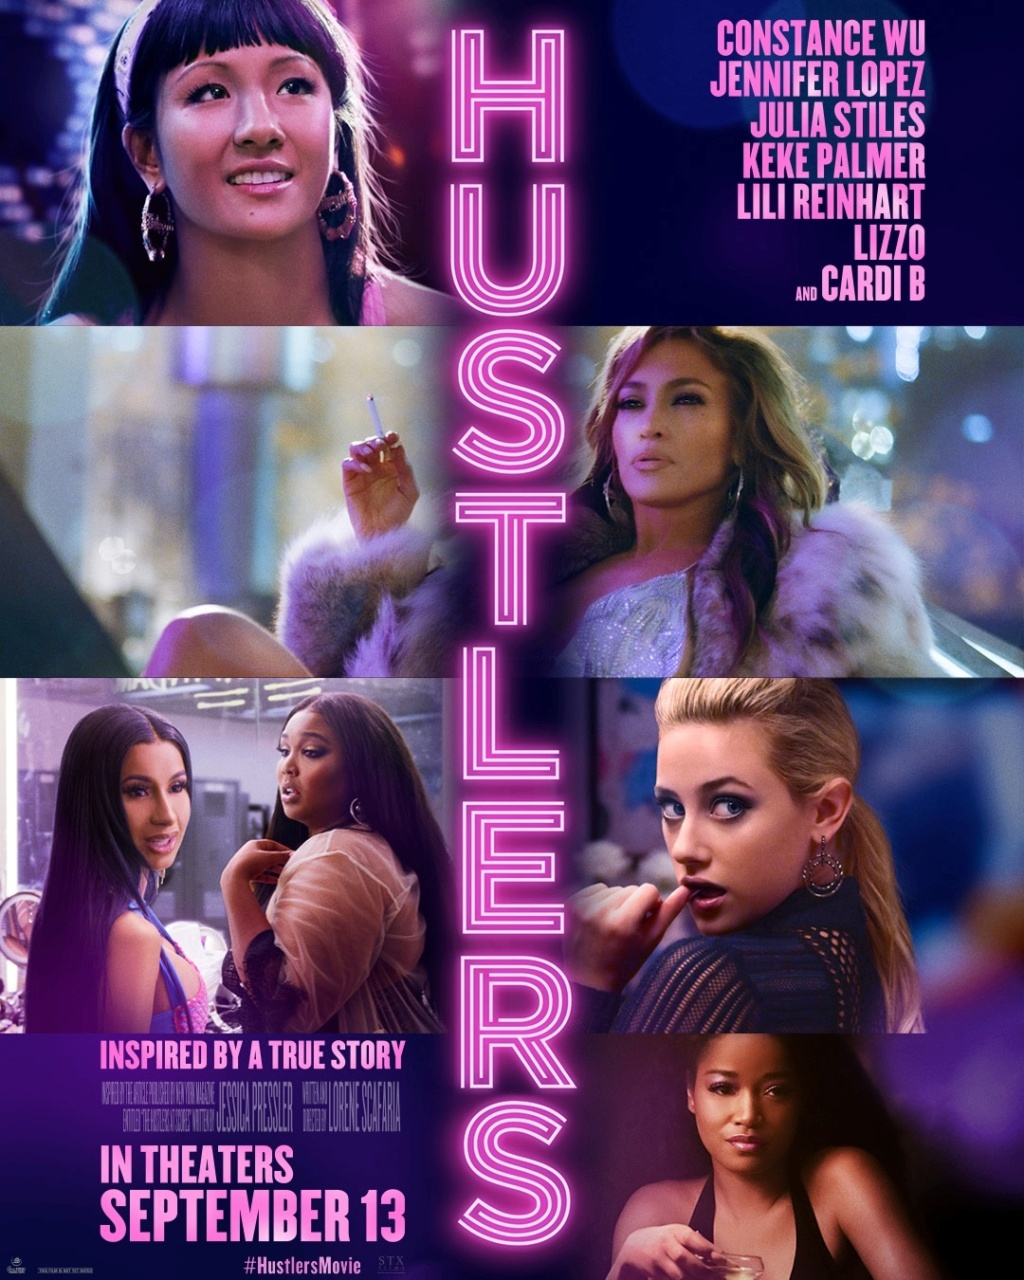 Jennifer Lopez - Σελίδα 32 2a53c310